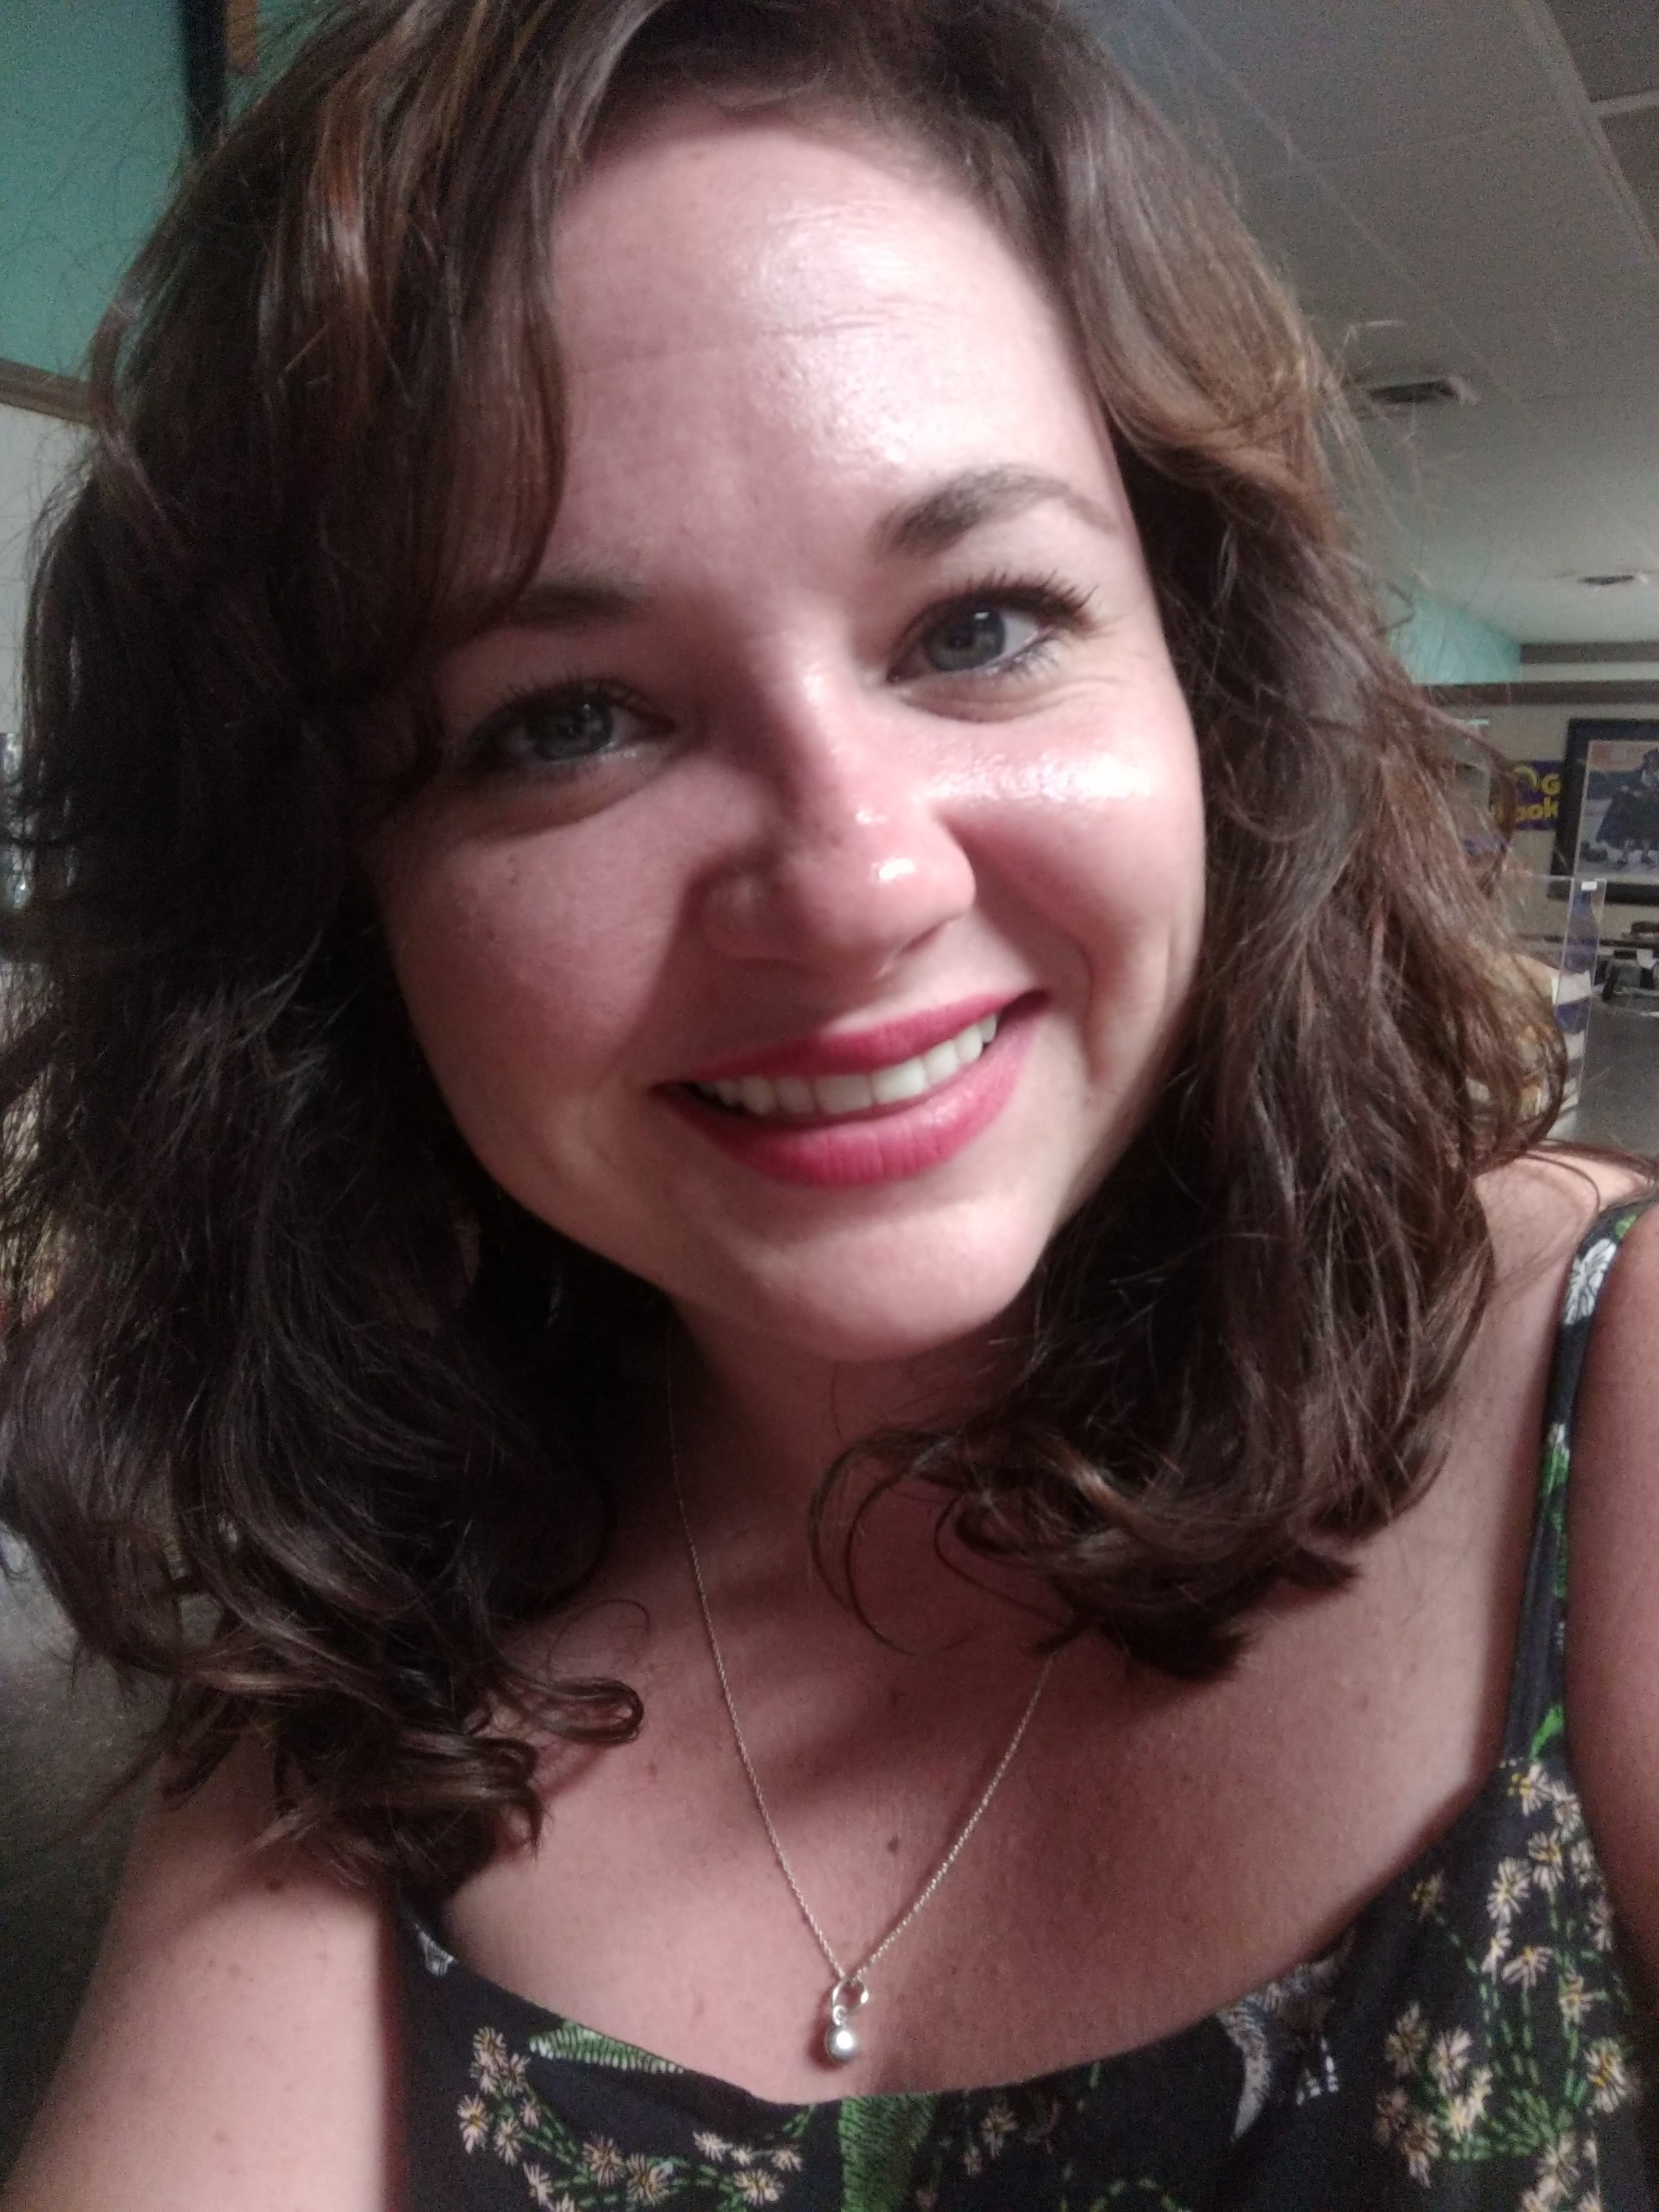 29-year-old, Single From: North Carolina, United States